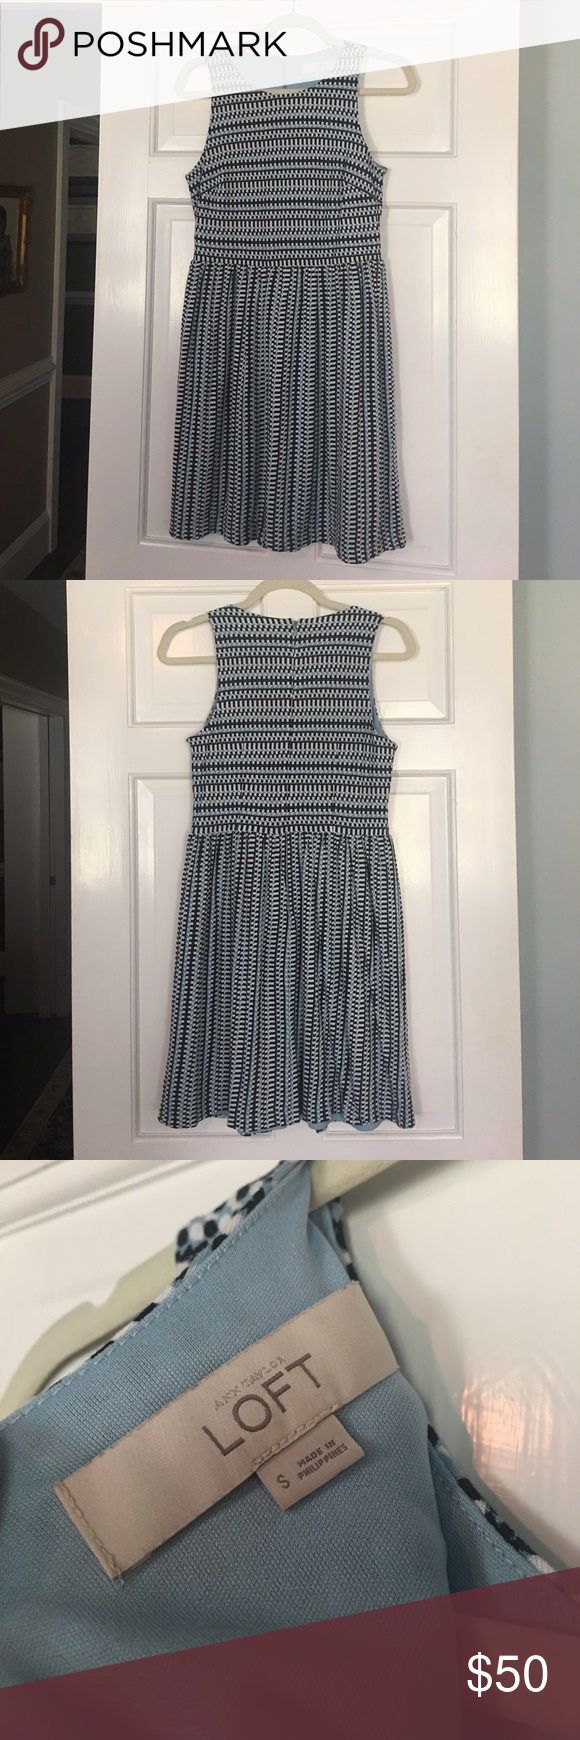 LOFT Dress in Baby Blue Size Small Loft dress, Dresses